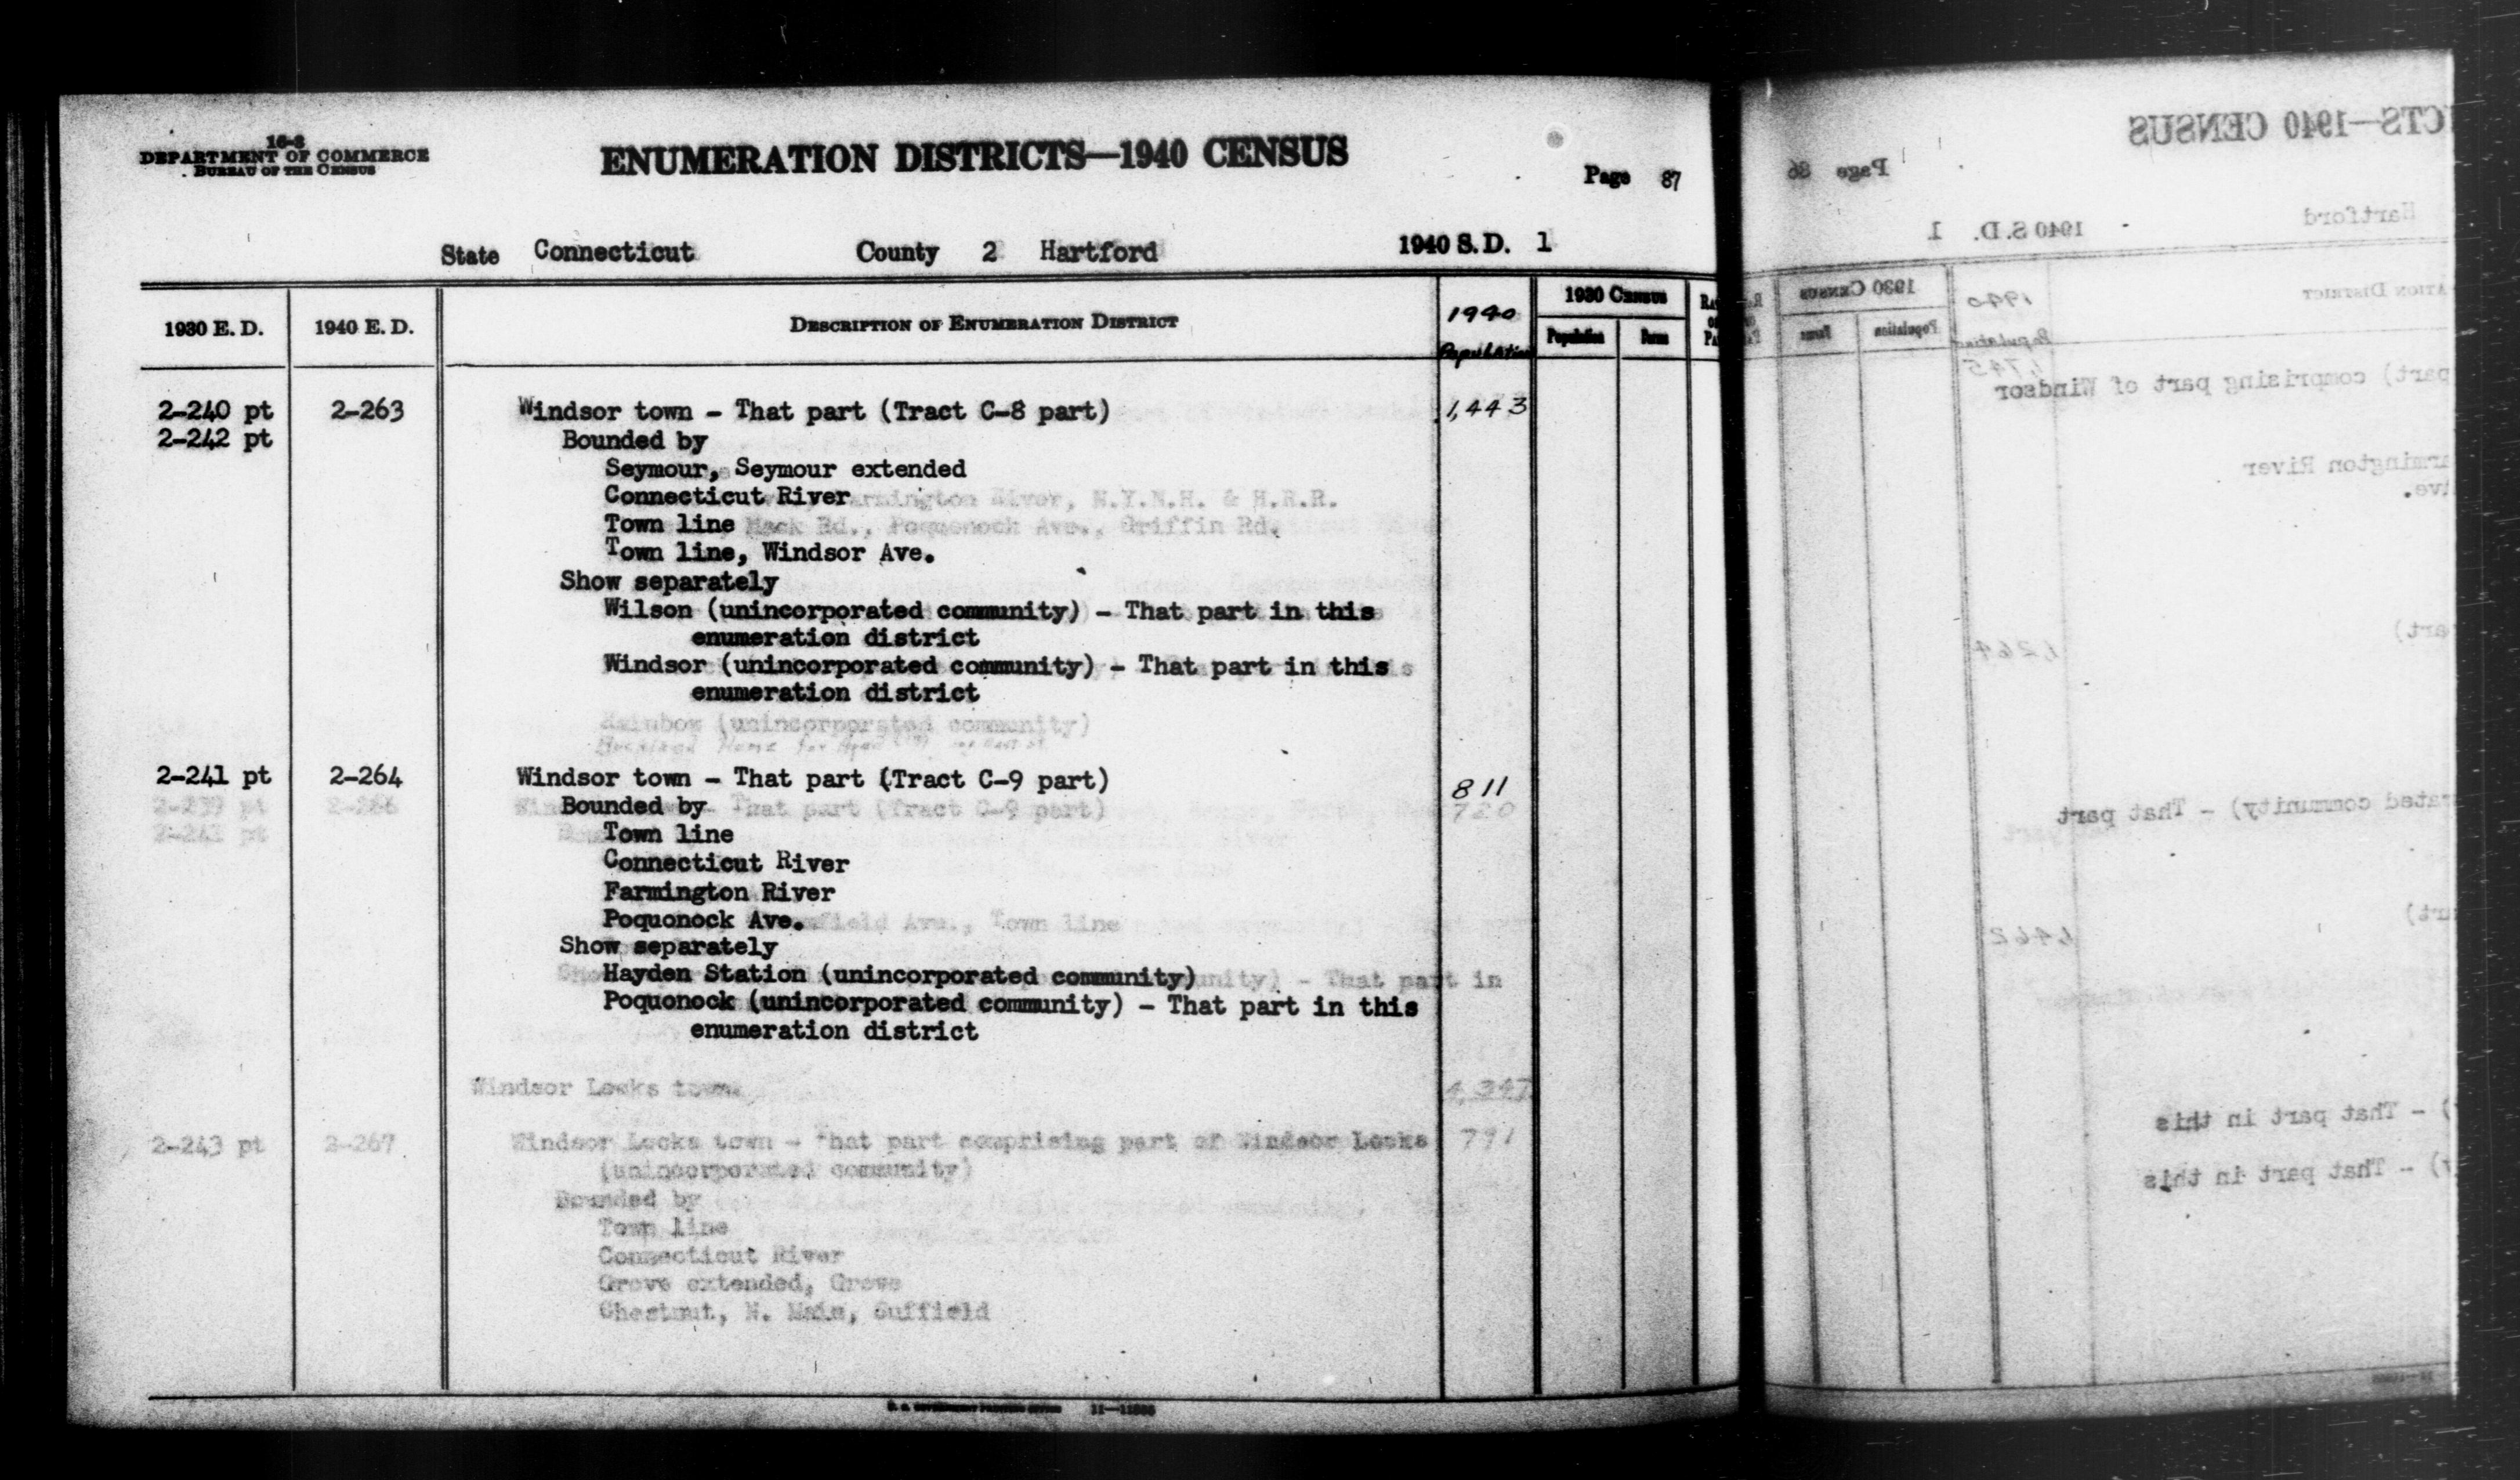 1940 Census Enumeration District Descriptions - Connecticut - Hartford County - ED 2-263, ED 2-264